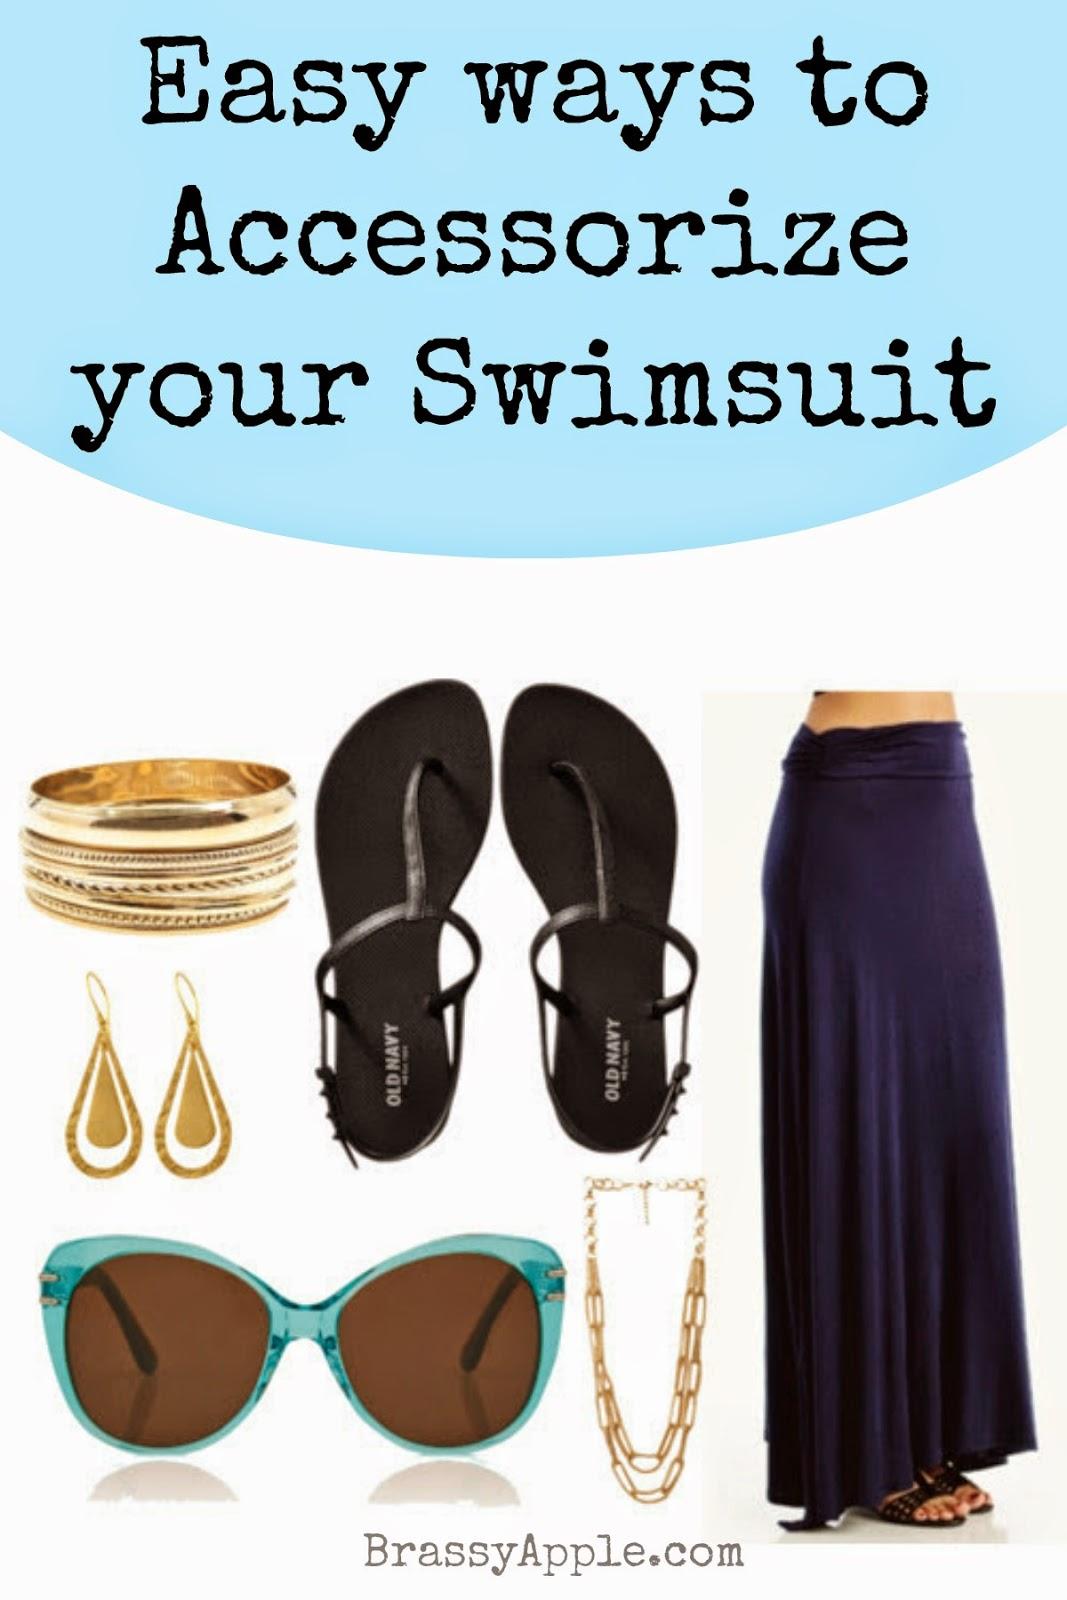 http://1.bp.blogspot.com/-lgKnobeCXnM/U08D4mM4z4I/AAAAAAAAT-8/QJrLLYoB_b8/s1600/accessorize+a+swimsuit+.jpg